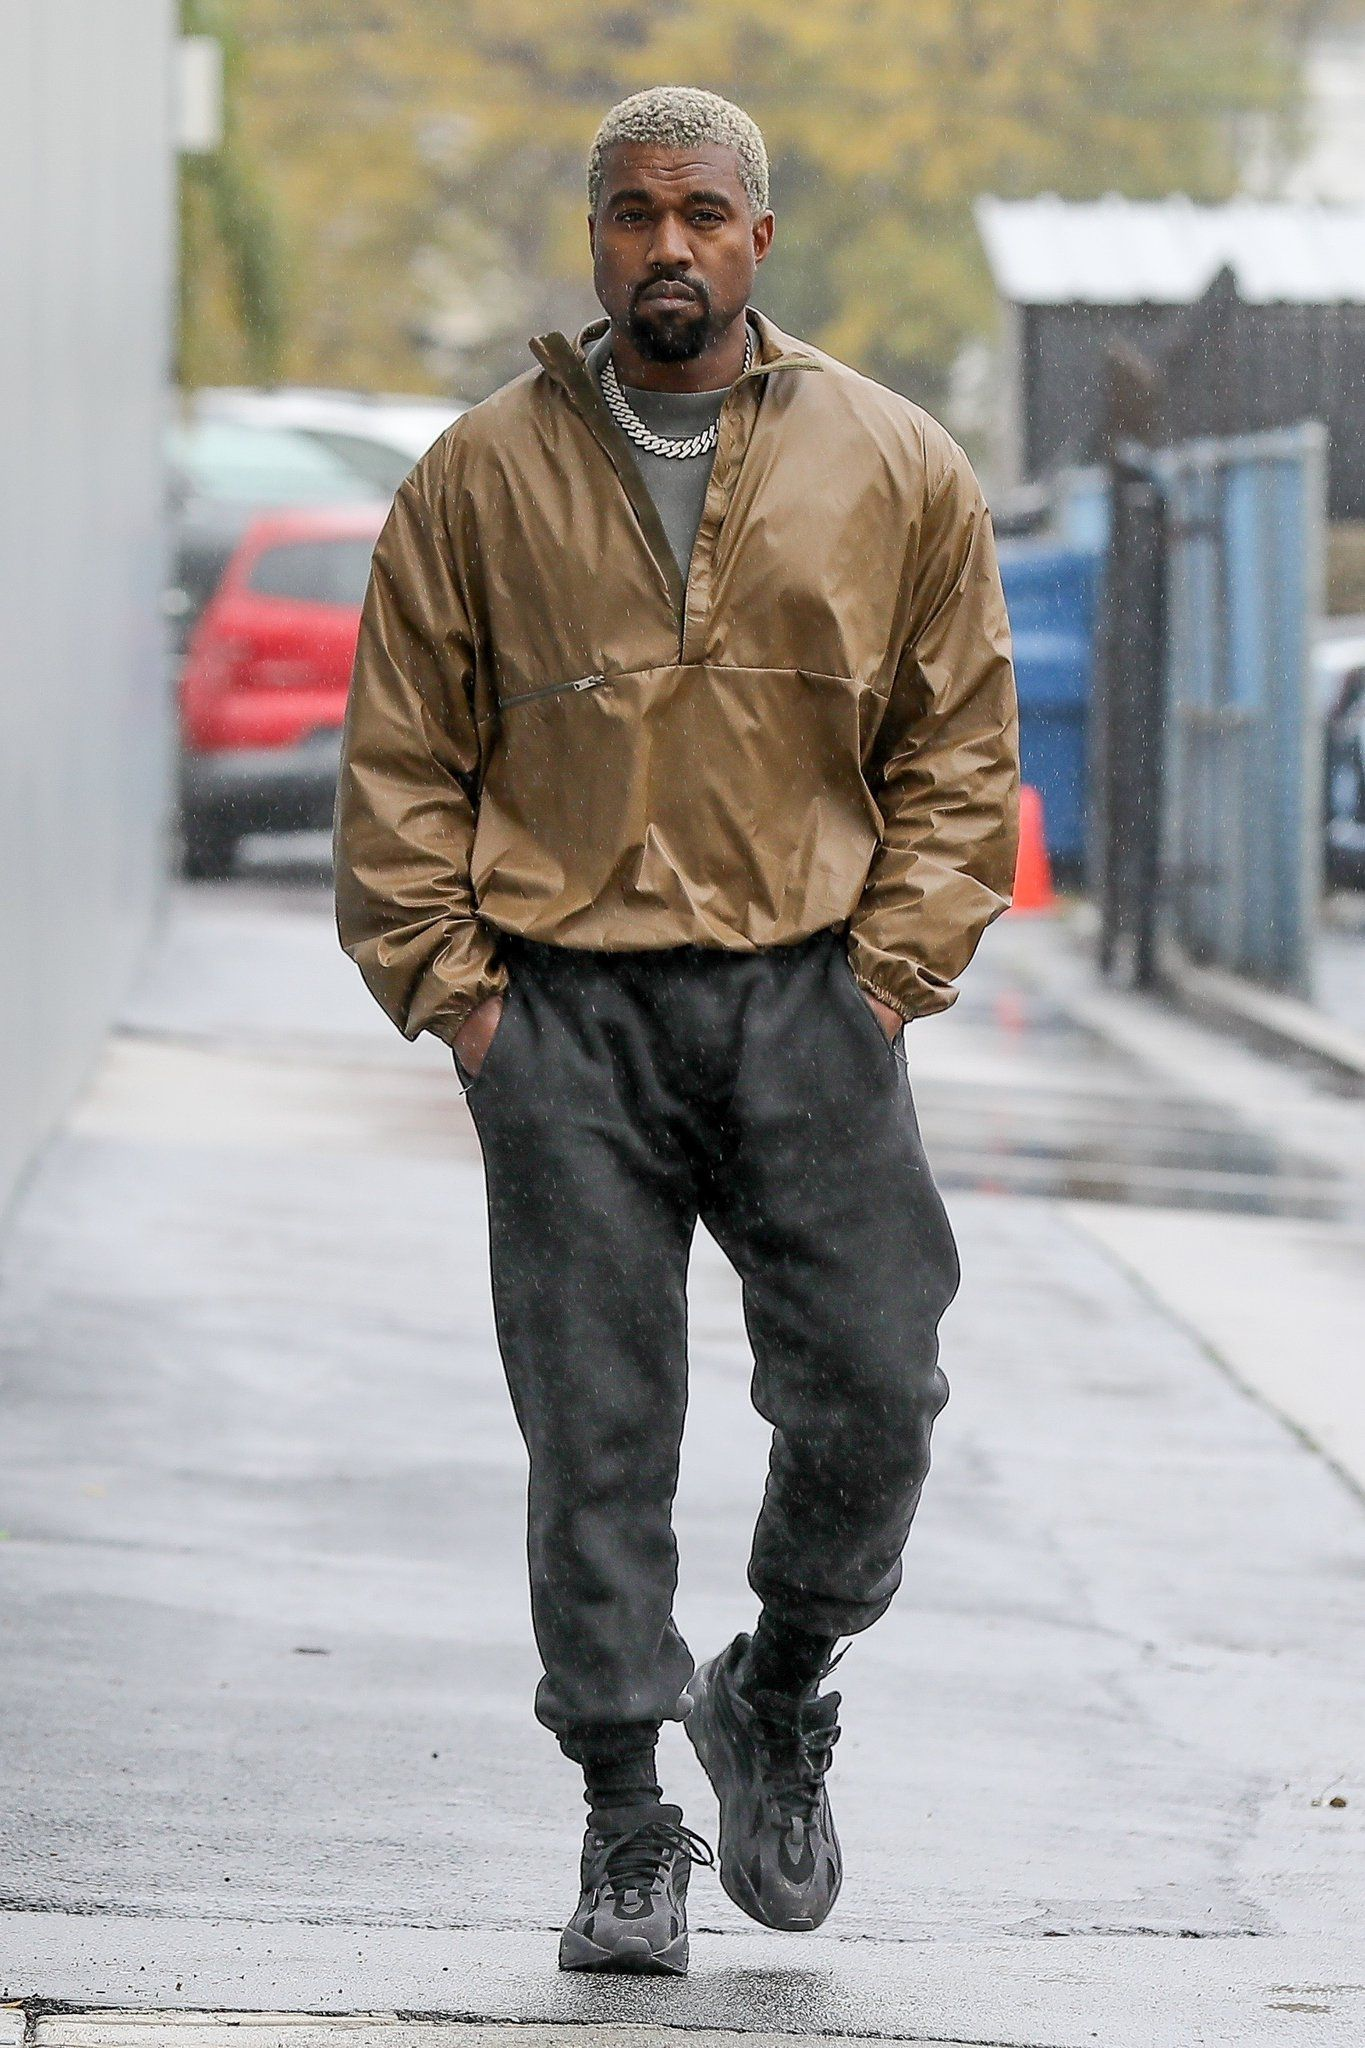 Pin By Vladislav Glazunov On Street Style In 2020 Kanye West Outfits Kanye Fashion Kanye West Style